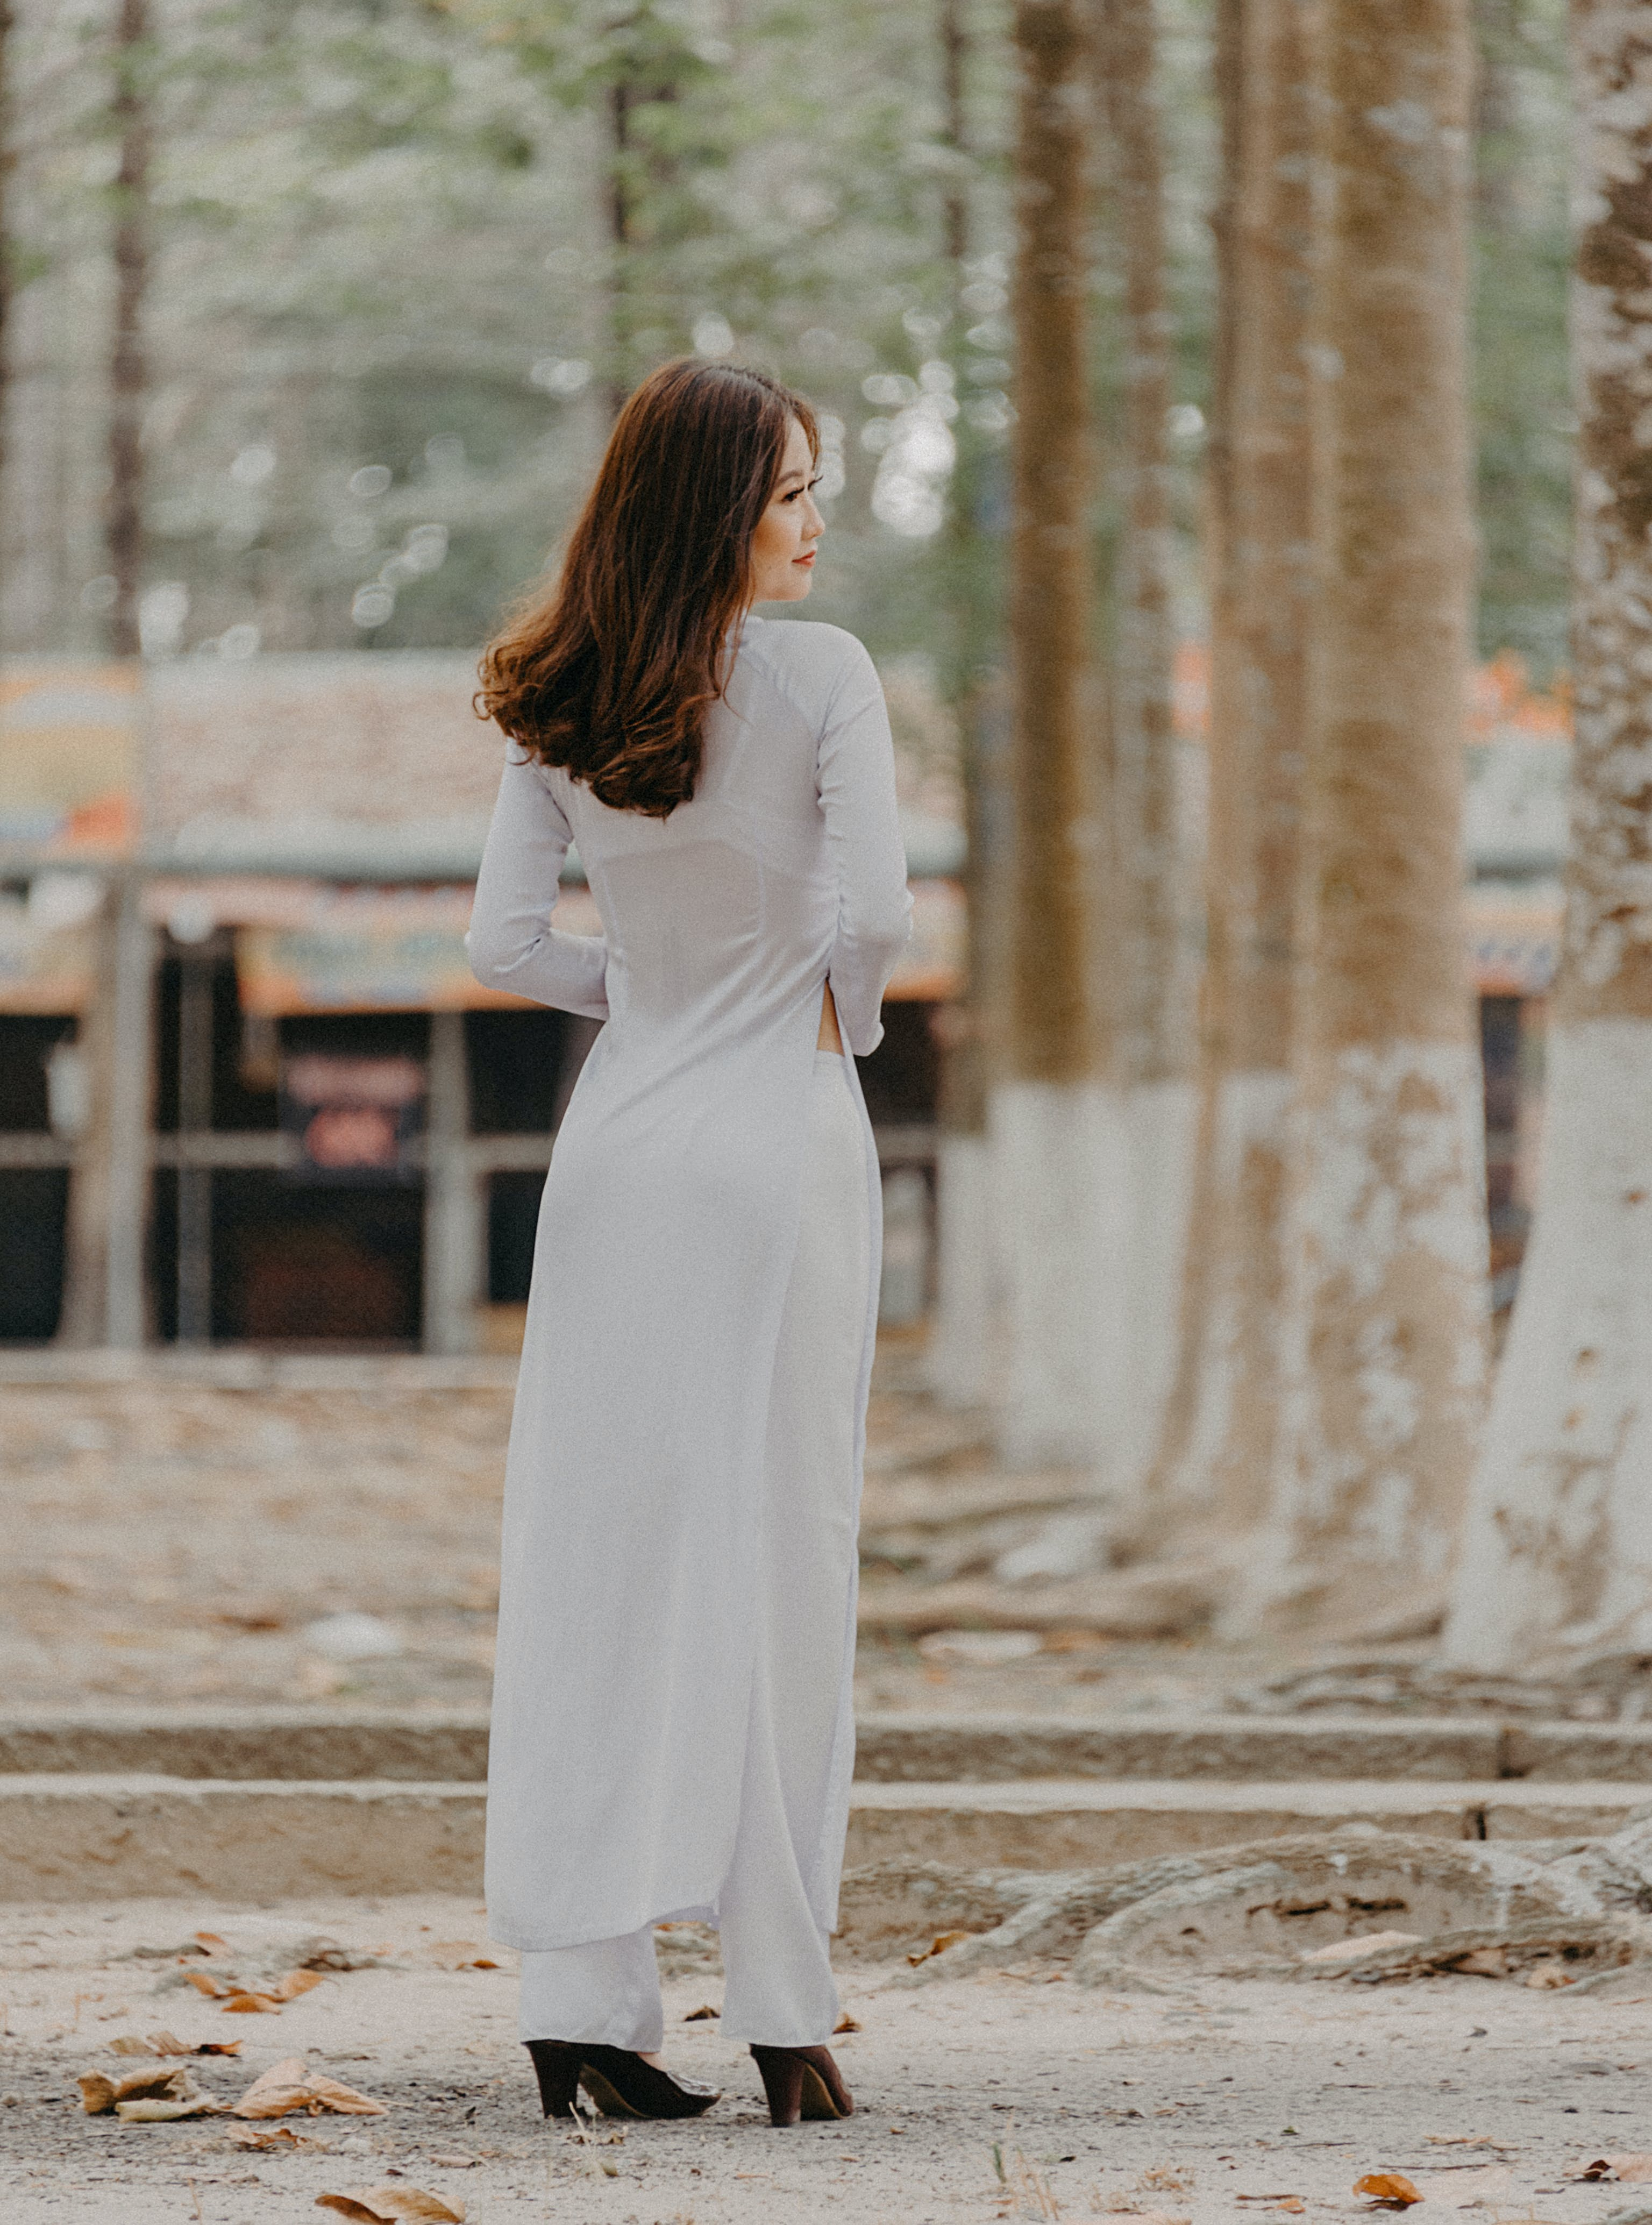 Photography of Woman Wearing White Dress